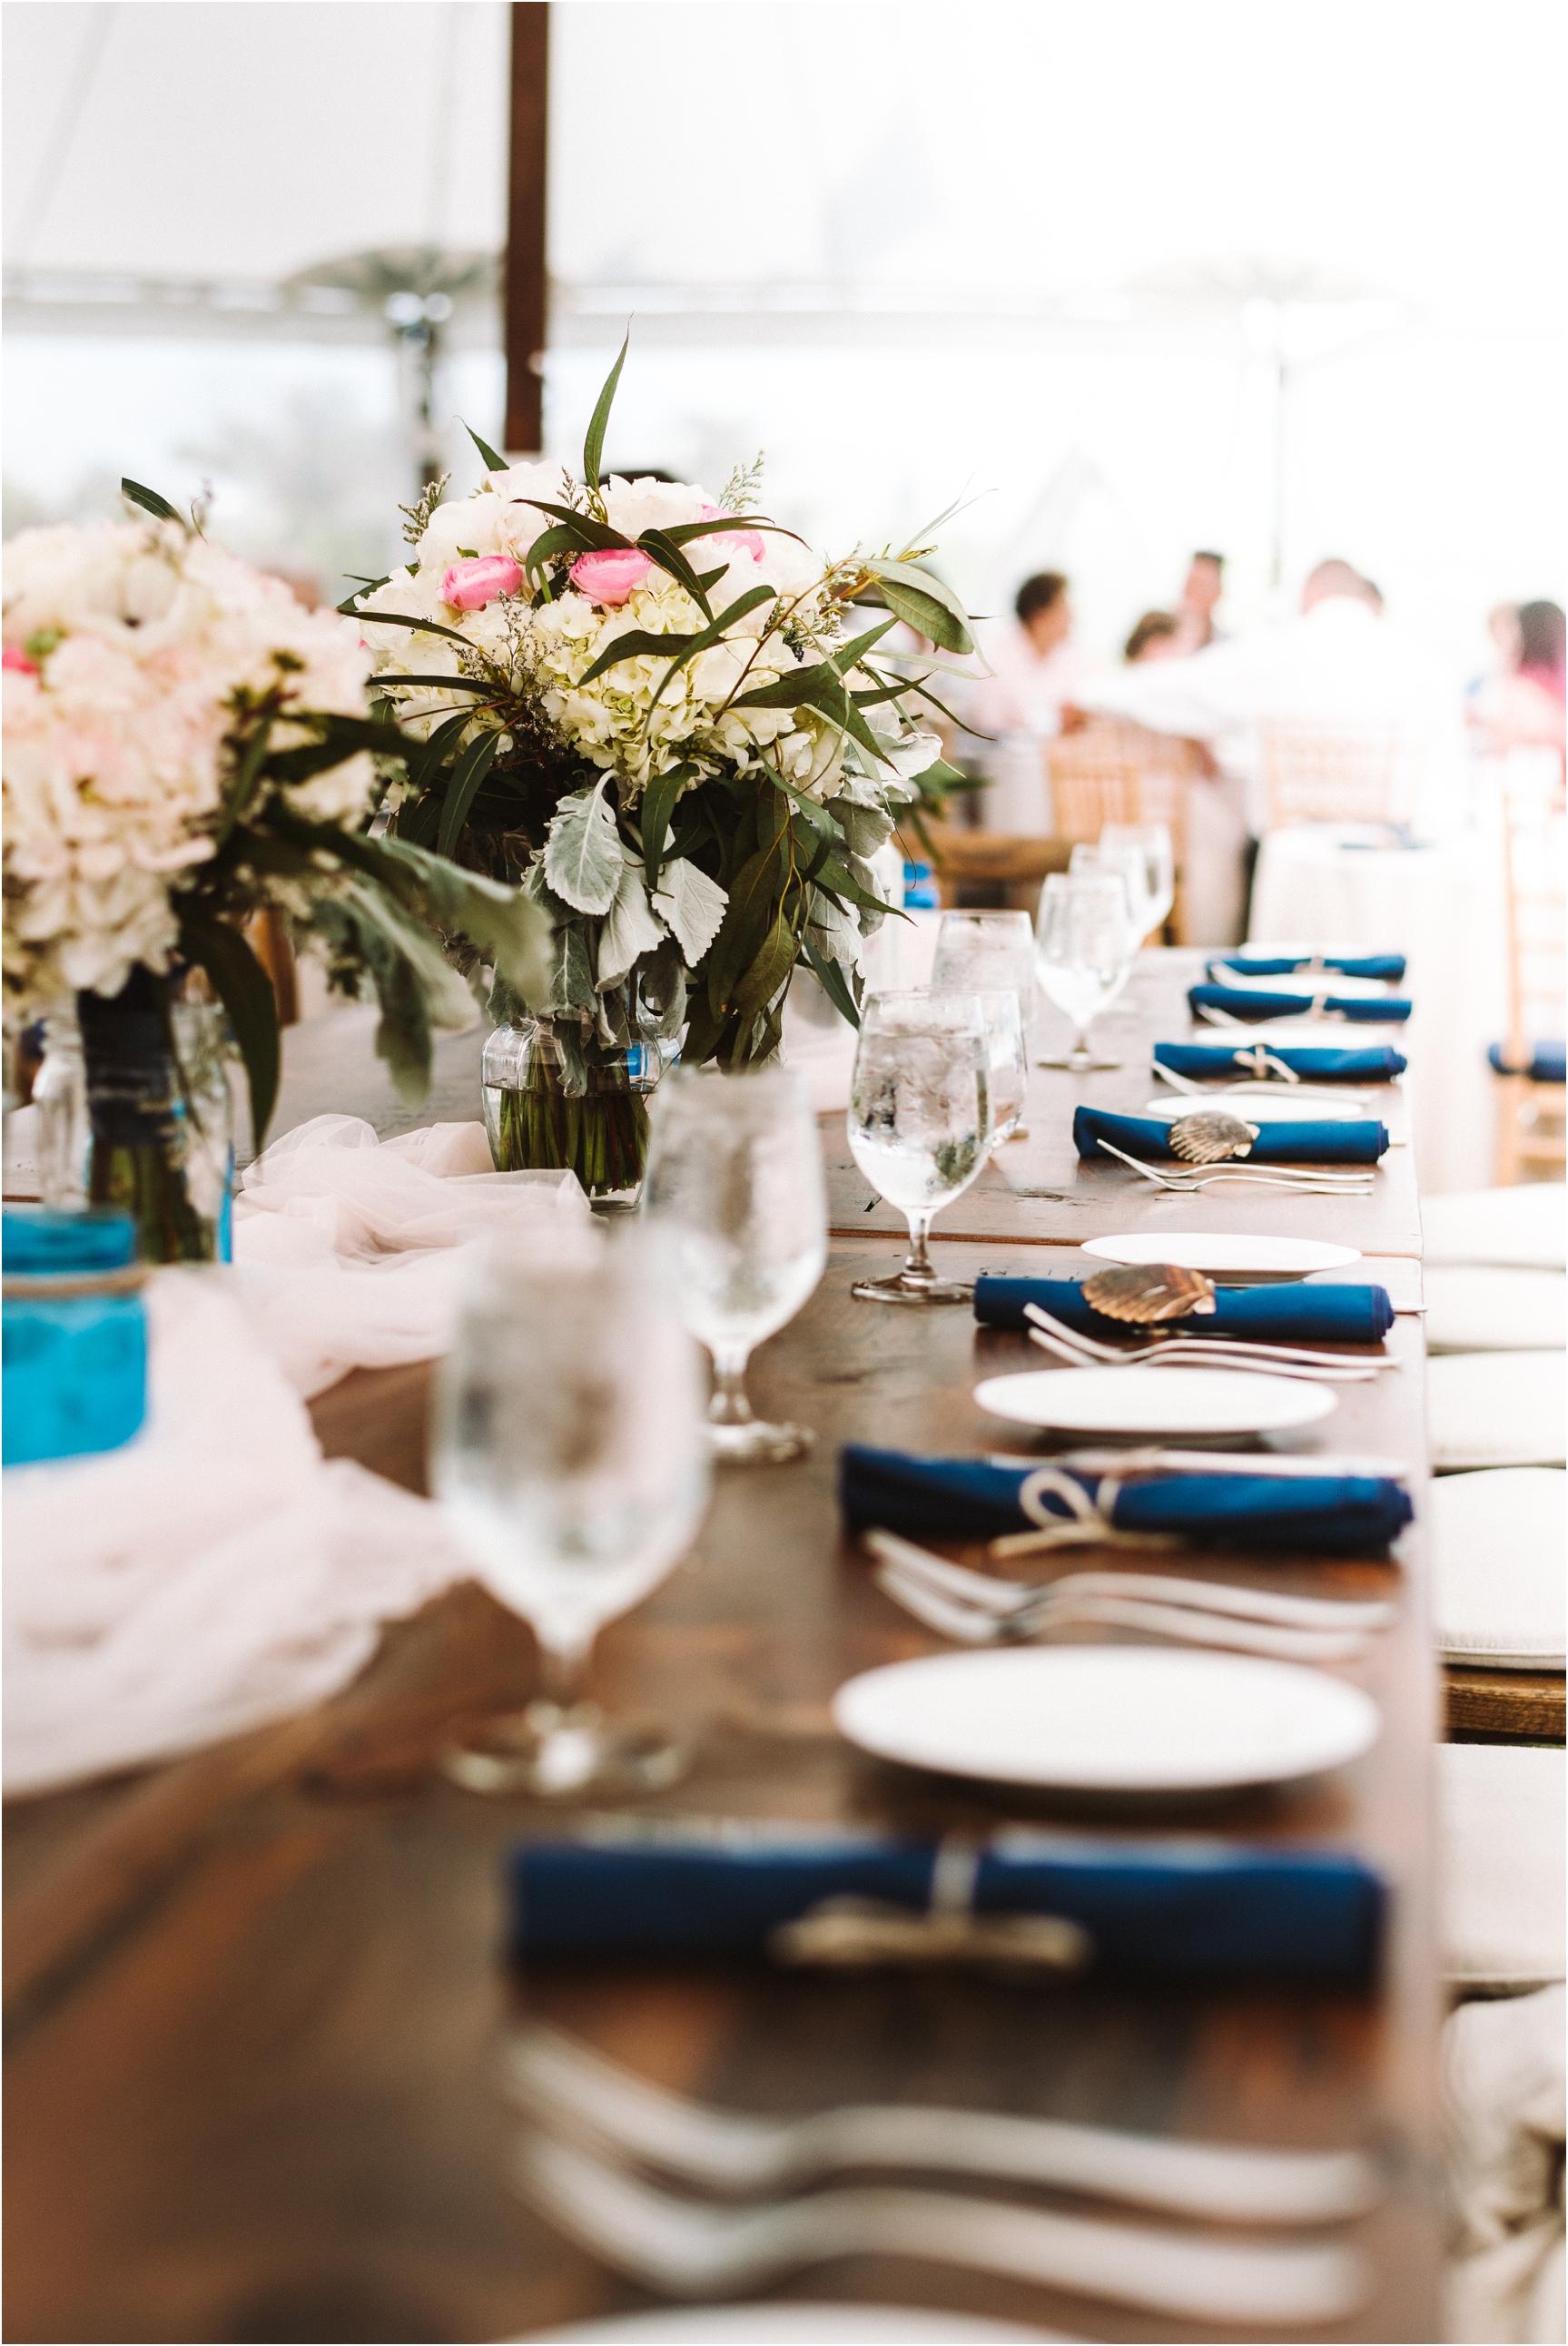 Sarah & Sam Pelham House Cape Cod Wedding Photographer-132.jpg